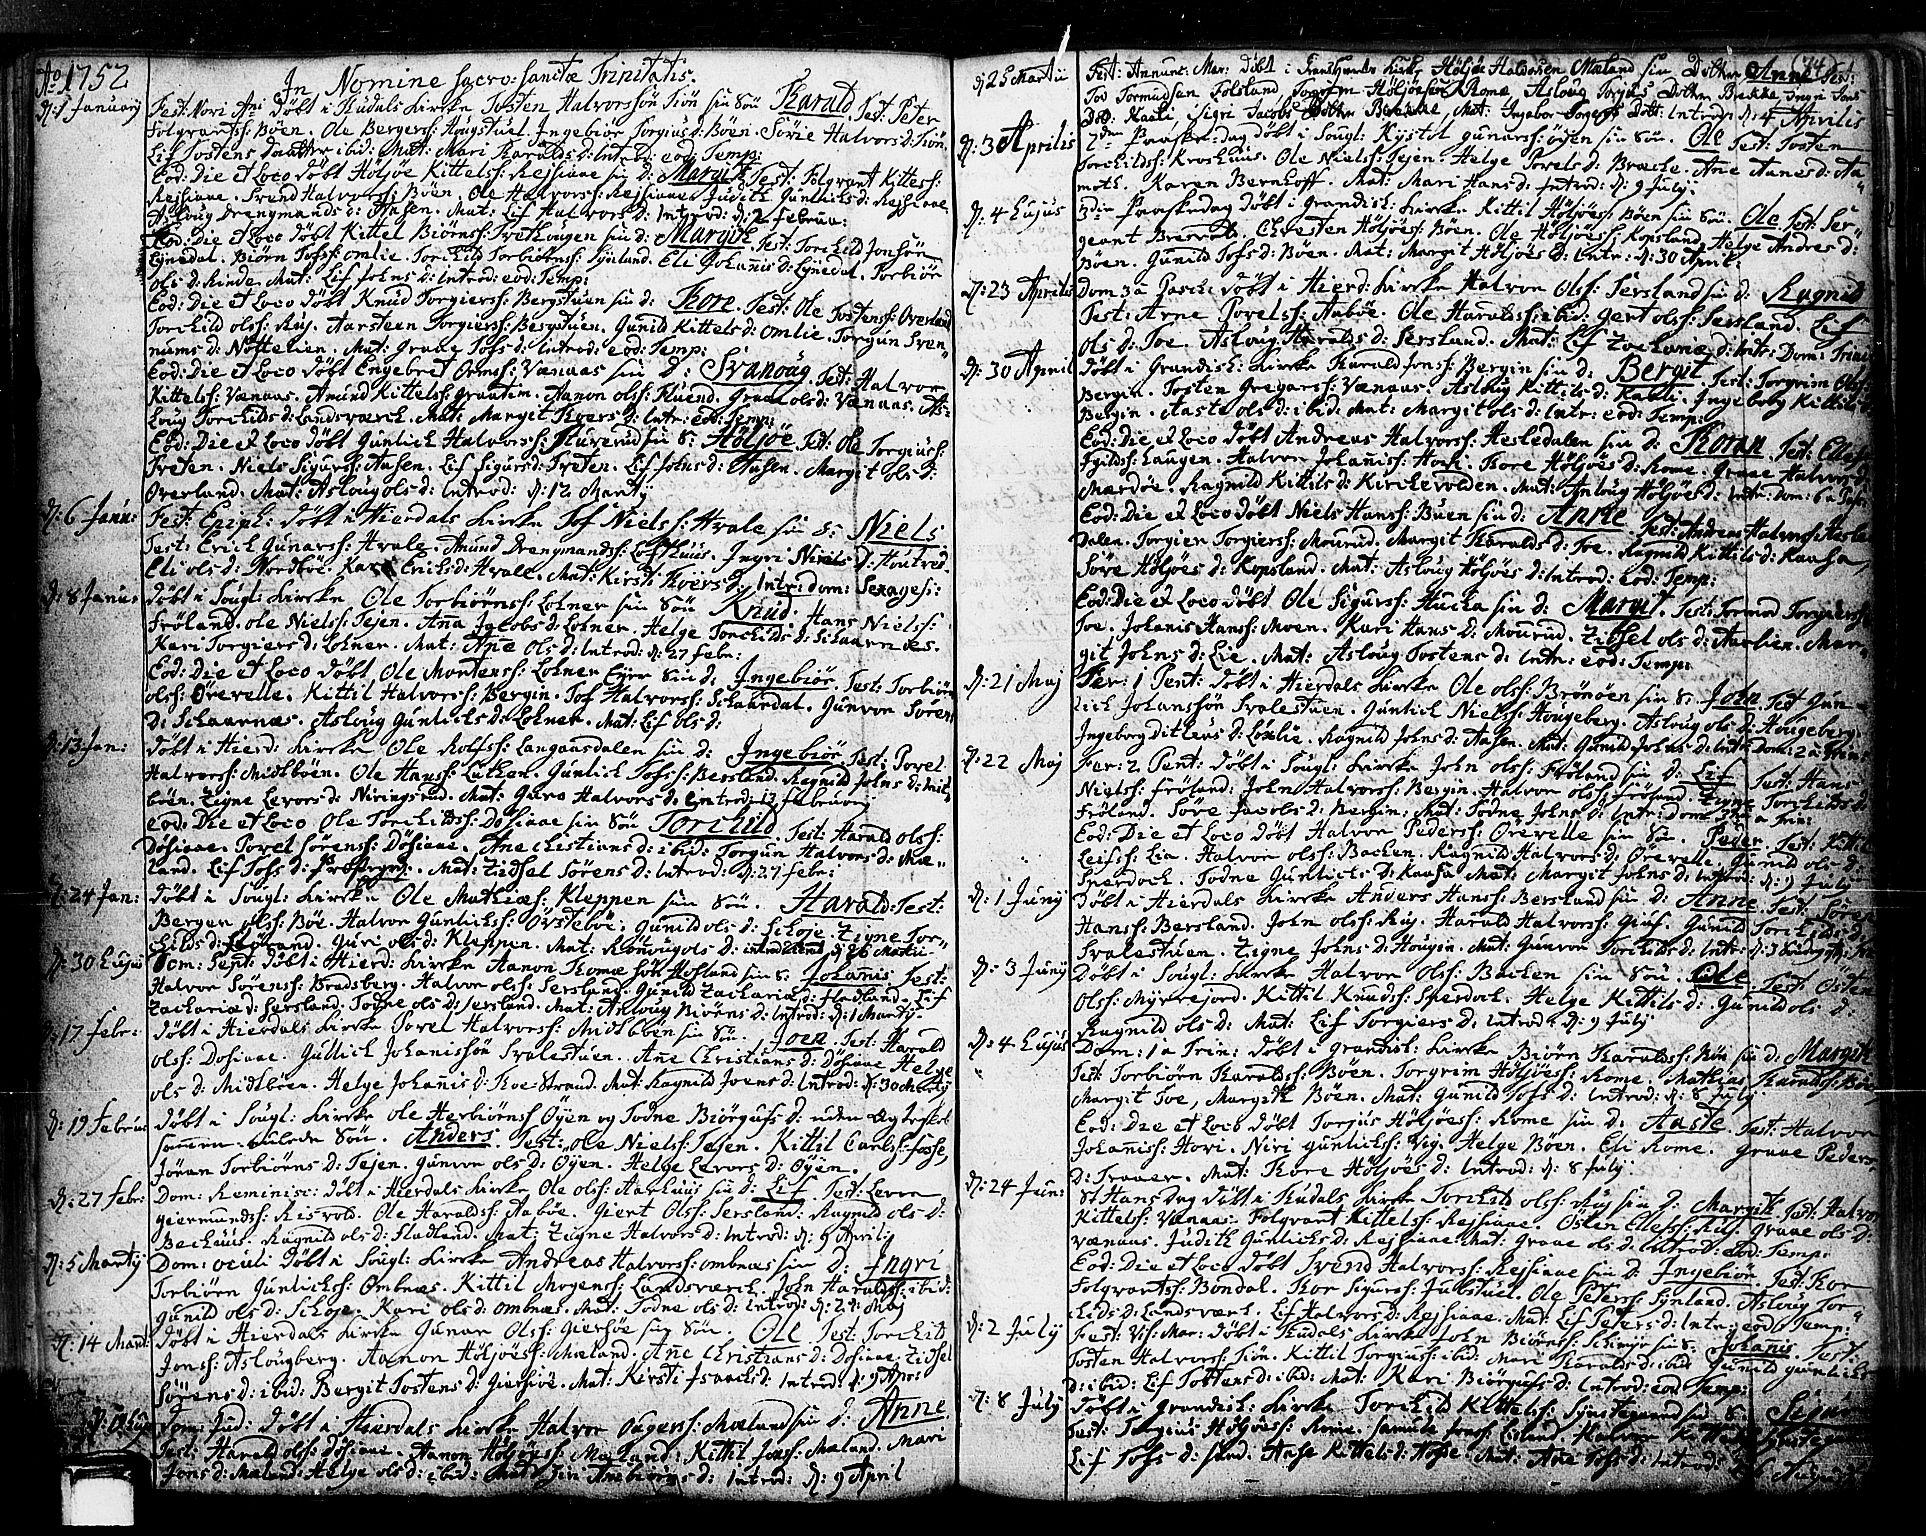 SAKO, Hjartdal kirkebøker, F/Fa/L0003: Ministerialbok nr. I 3, 1727-1775, s. 74